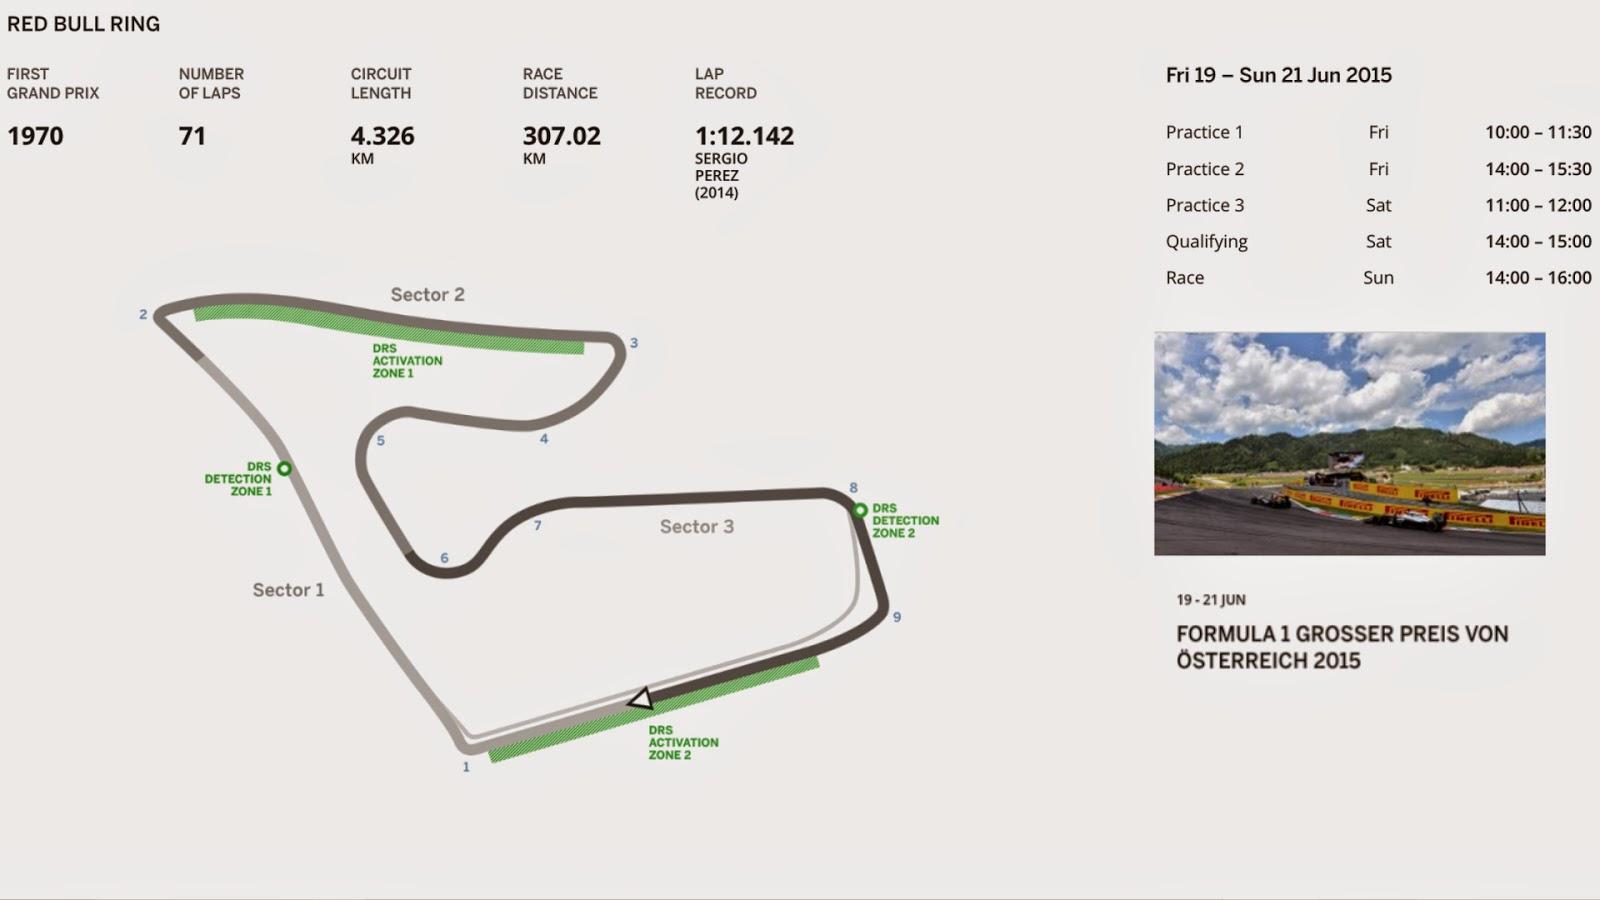 Pocket Hobby - www.pockethobby.com - F-1 - Austria Race